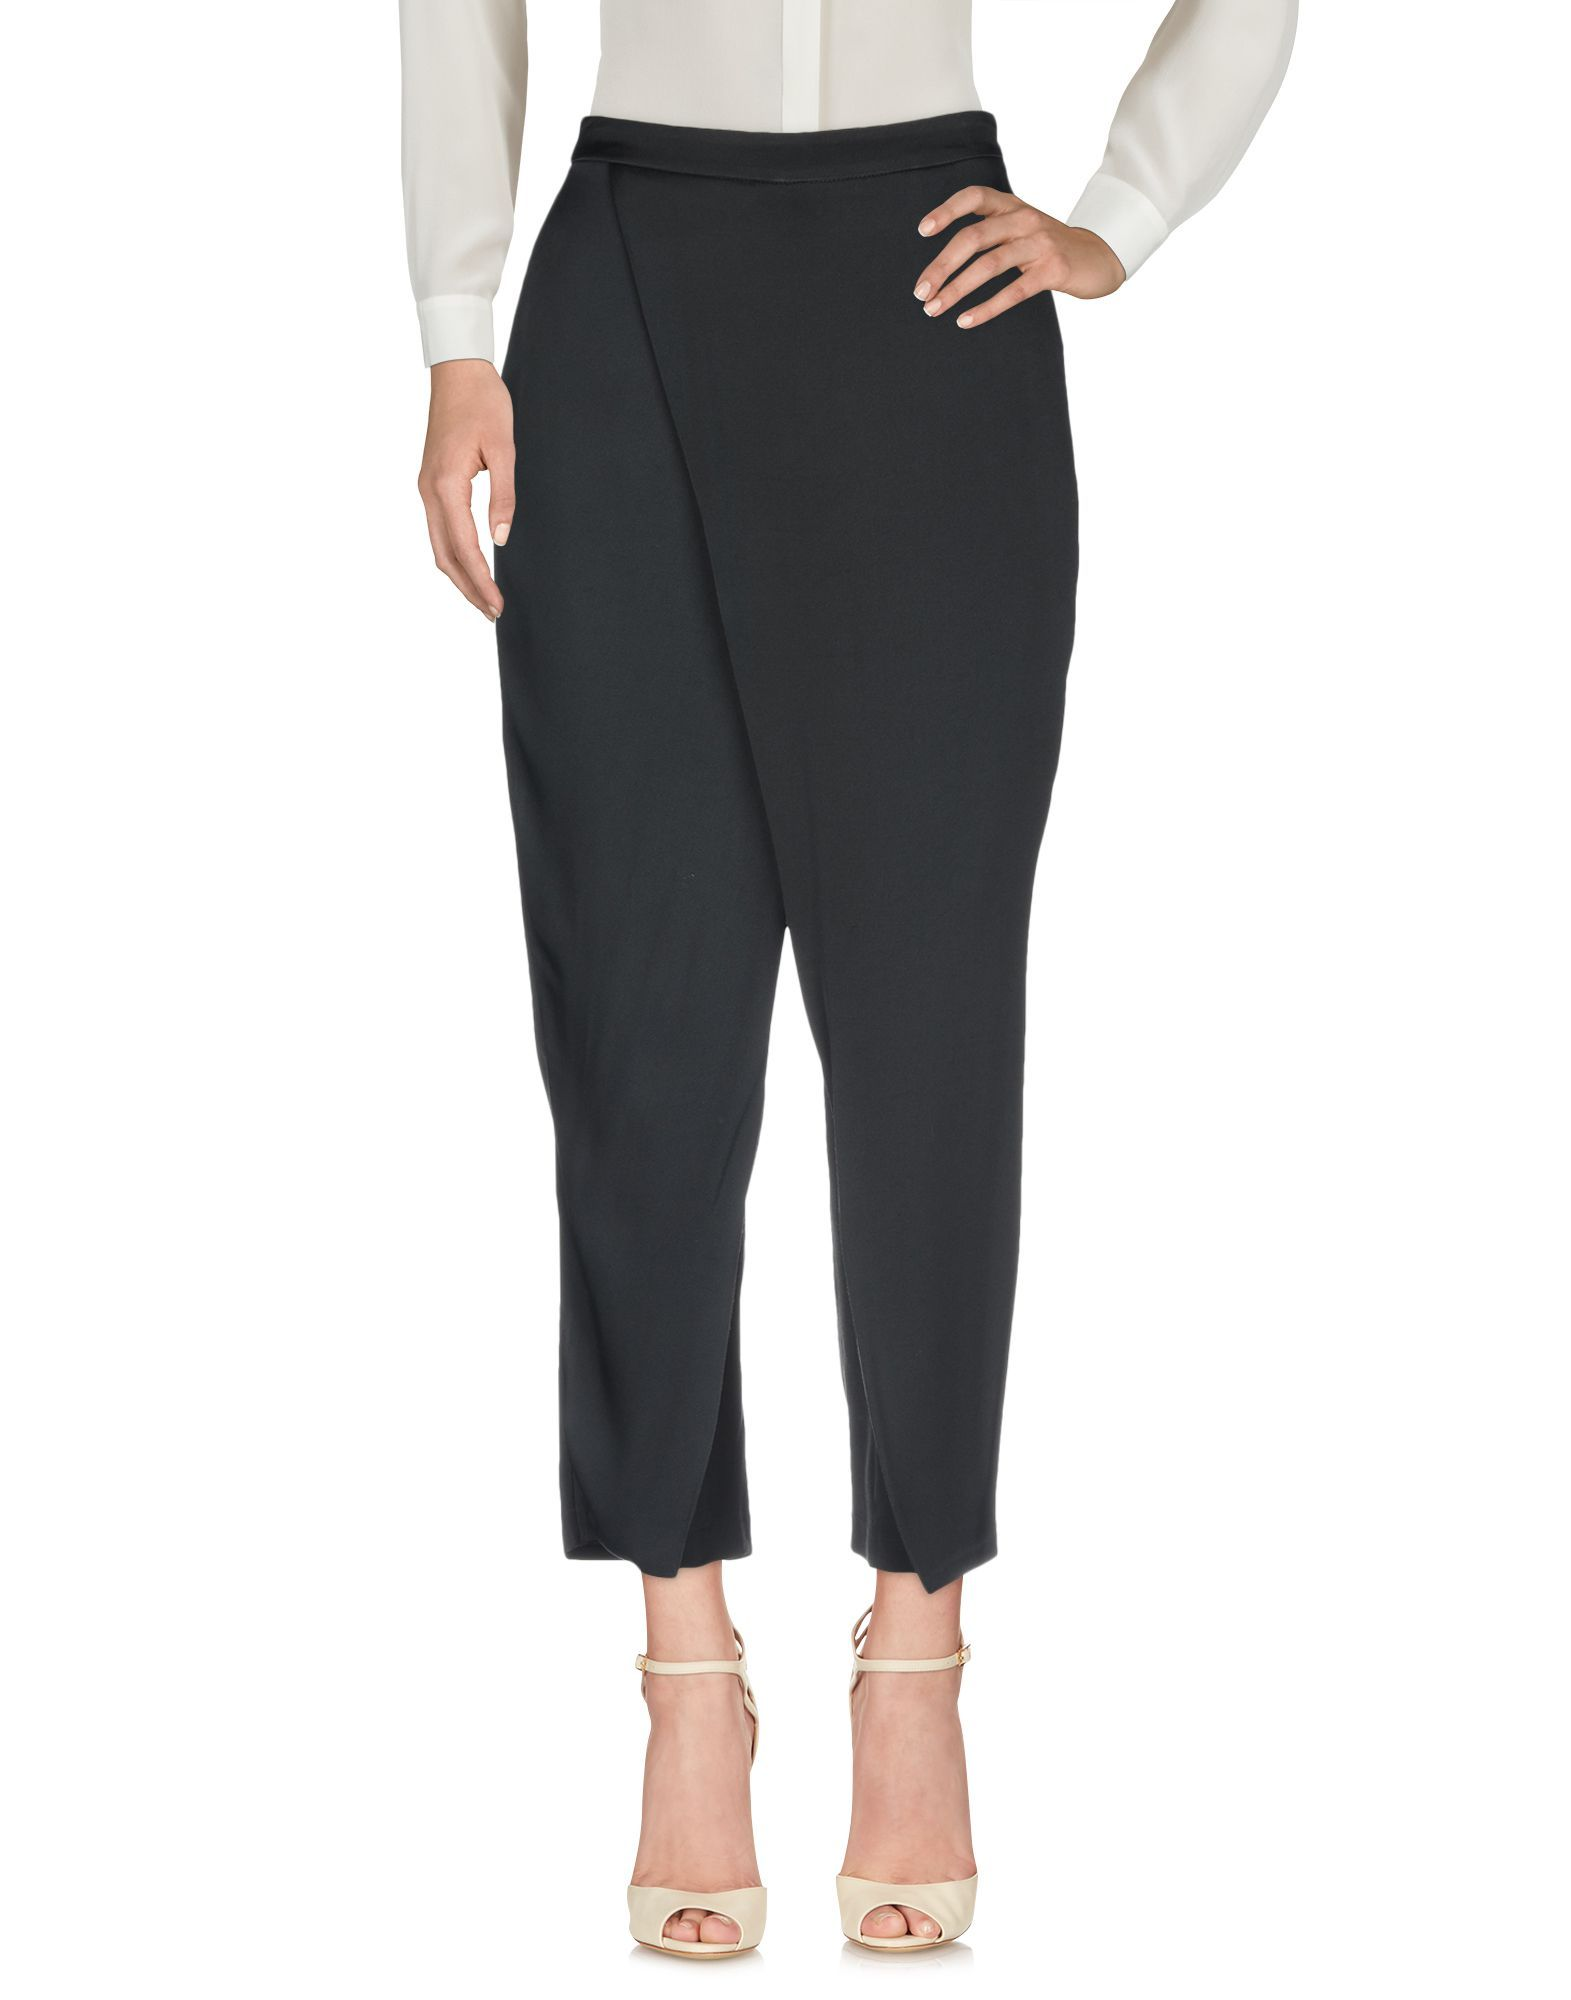 Trousers Federica Tosi Black Women's Acetate